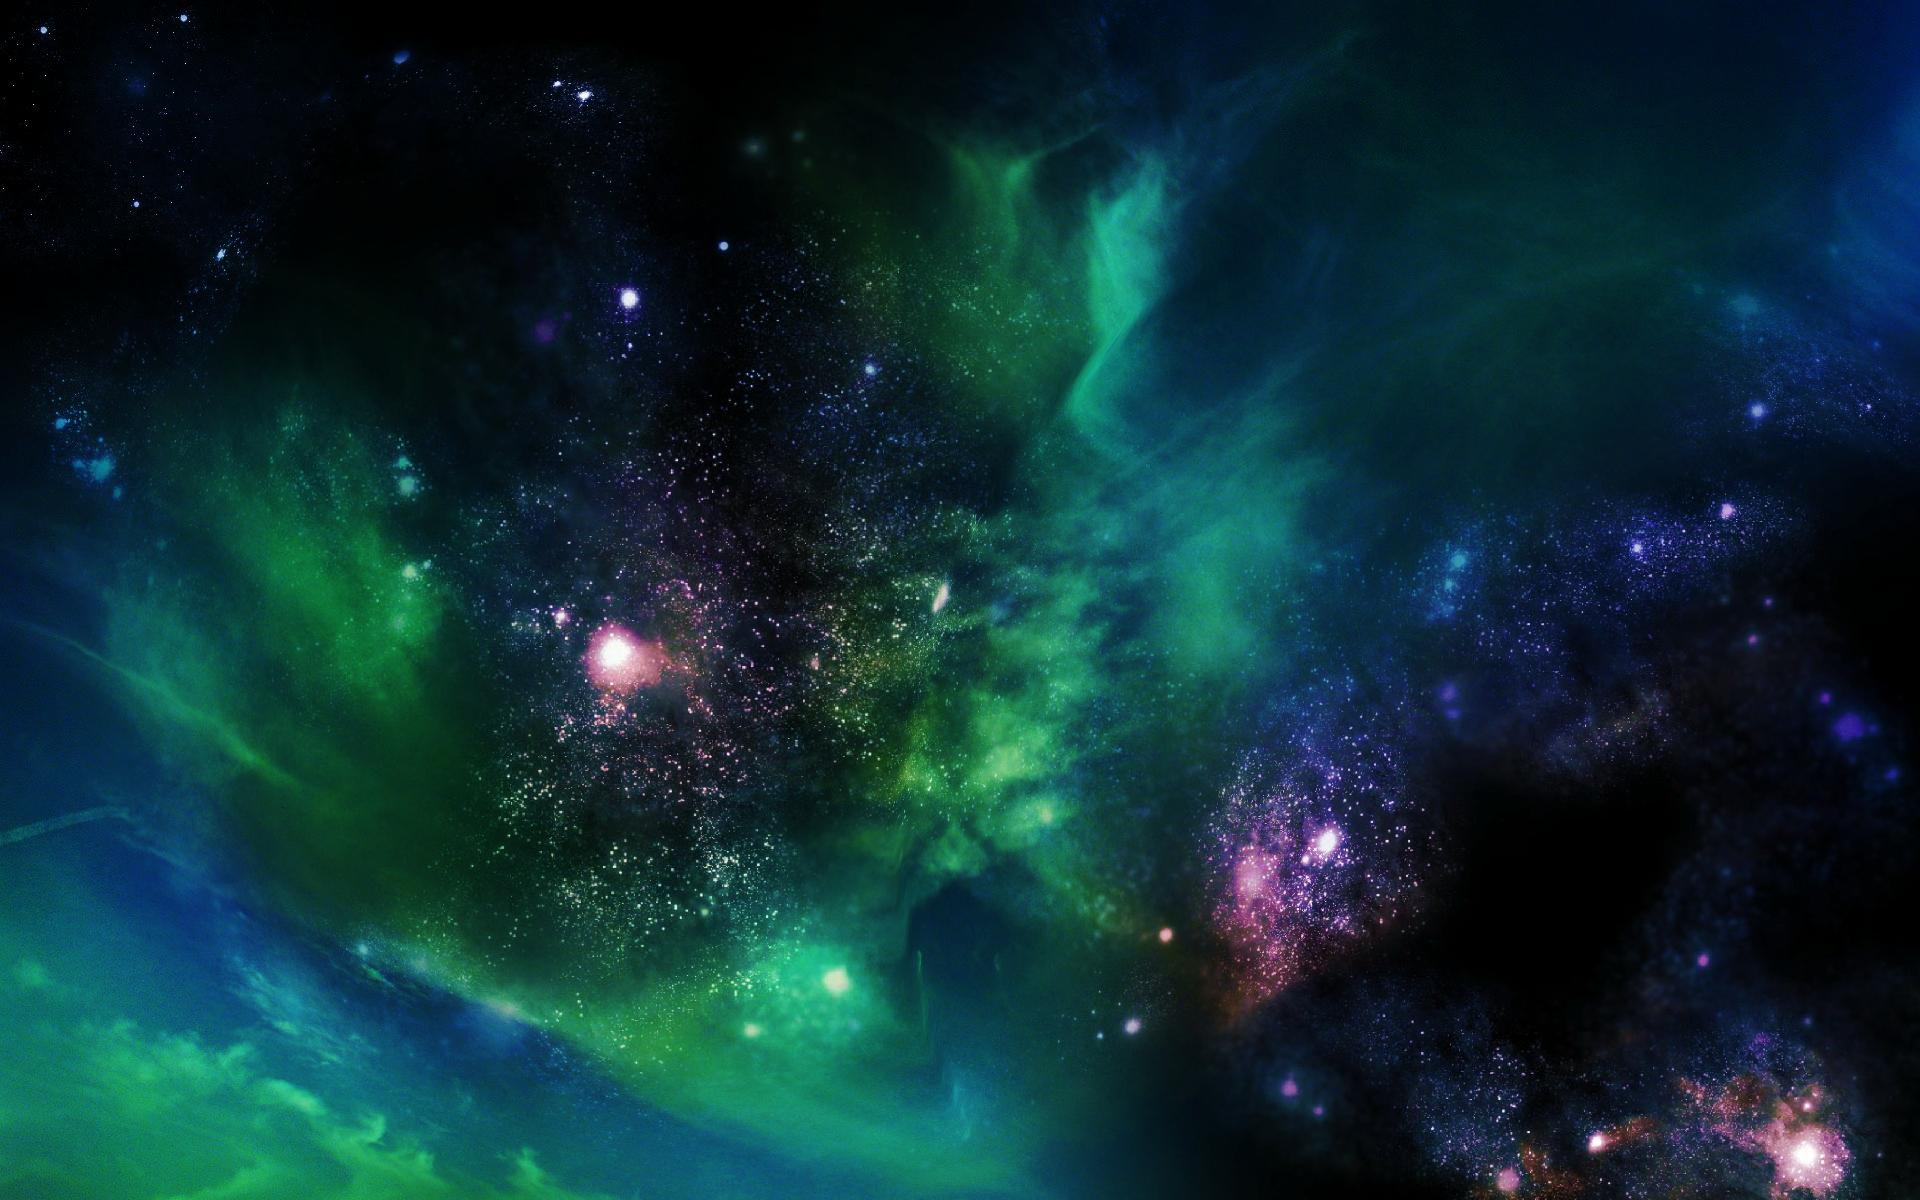 colorful galaxy stars - HD1920×1200